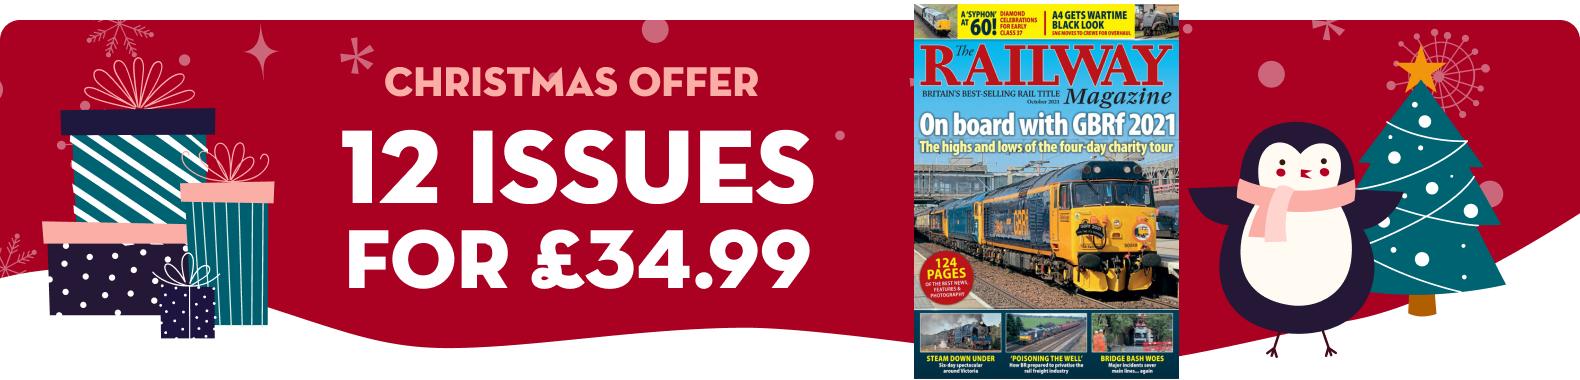 The Railway Magazine - XMAS2021